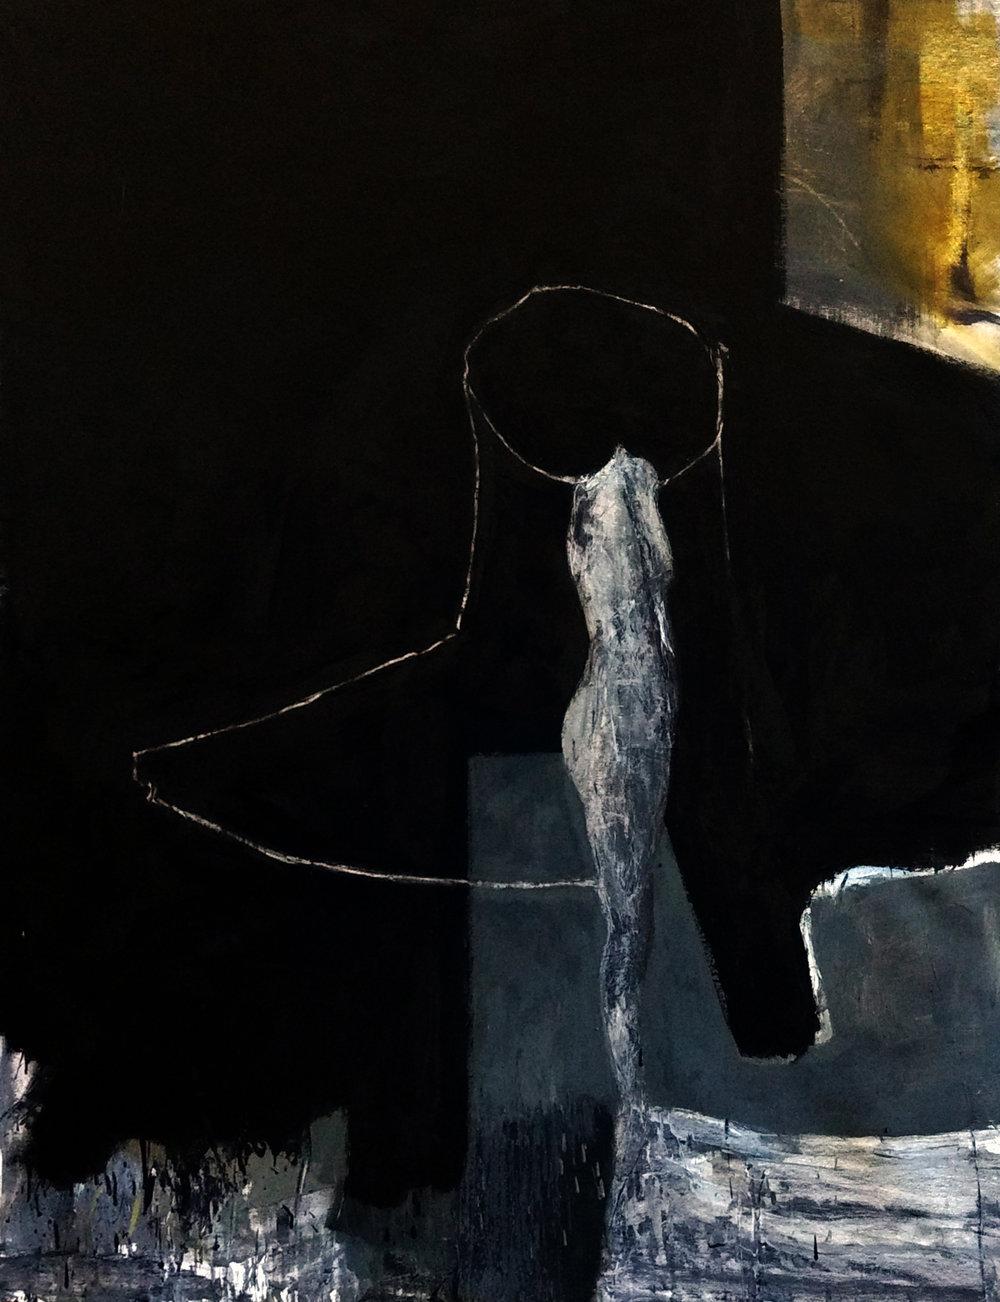 Maniquí de mujer,  2017     Óleo sobre lienzo  130 x 100 cm